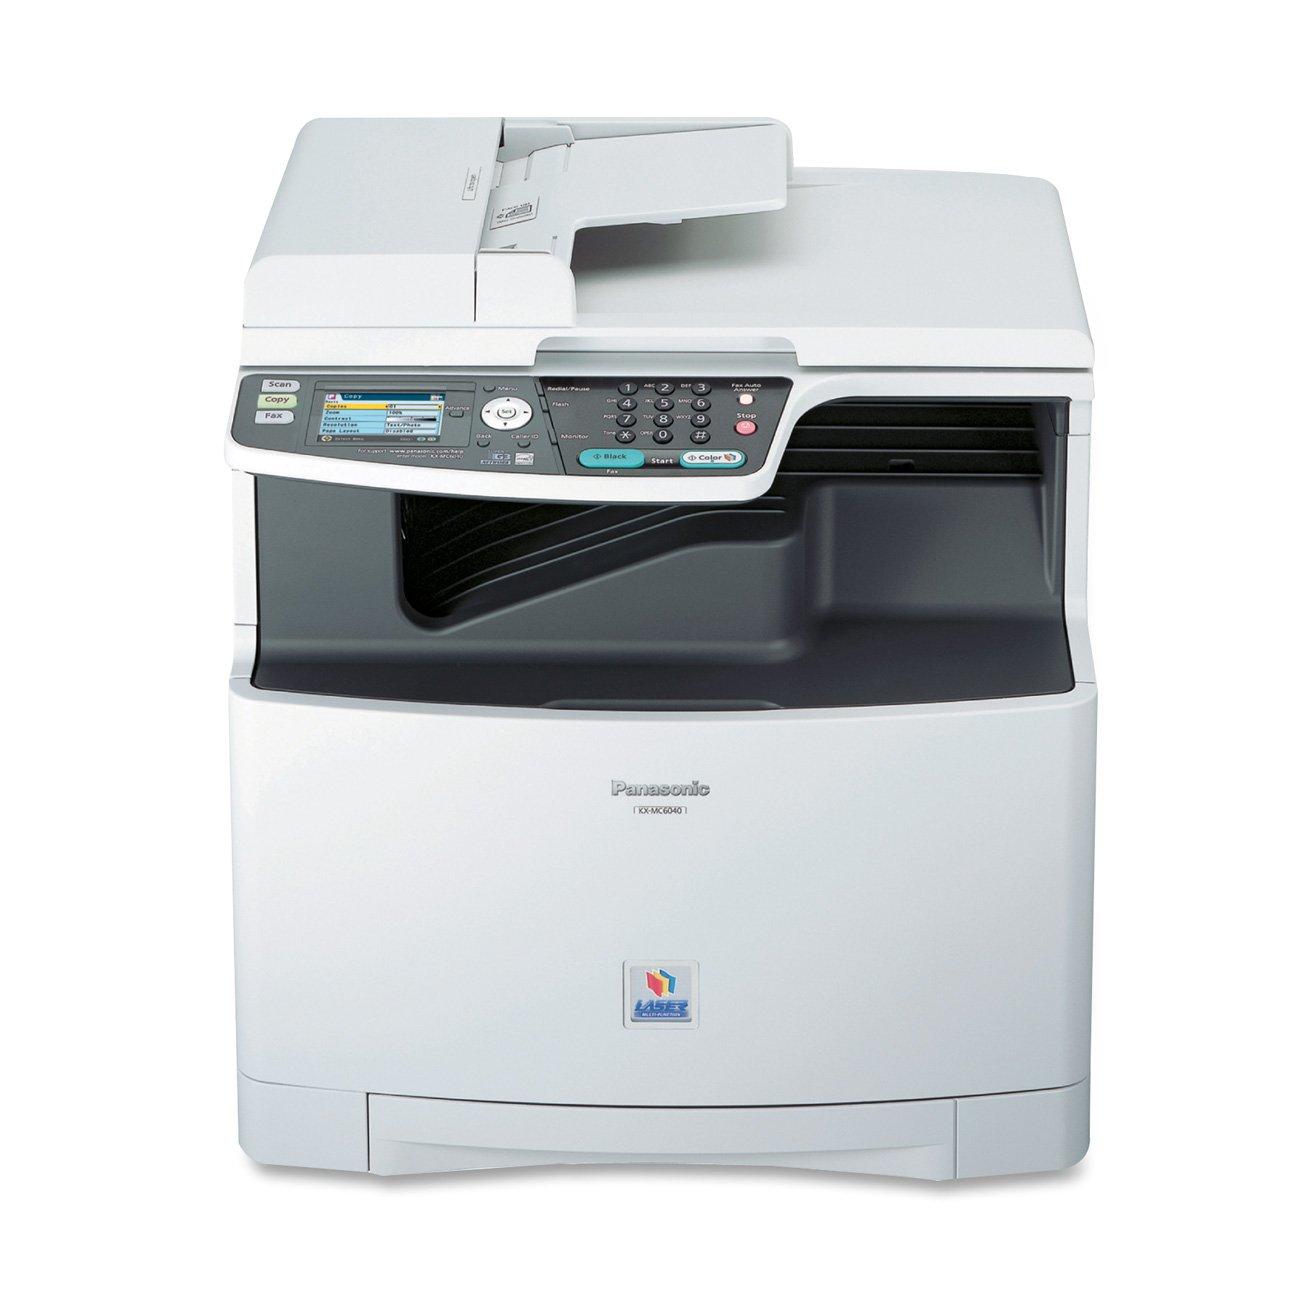 Amazon.com: Panasonic KX-MC6040 Color Impresora láser ...